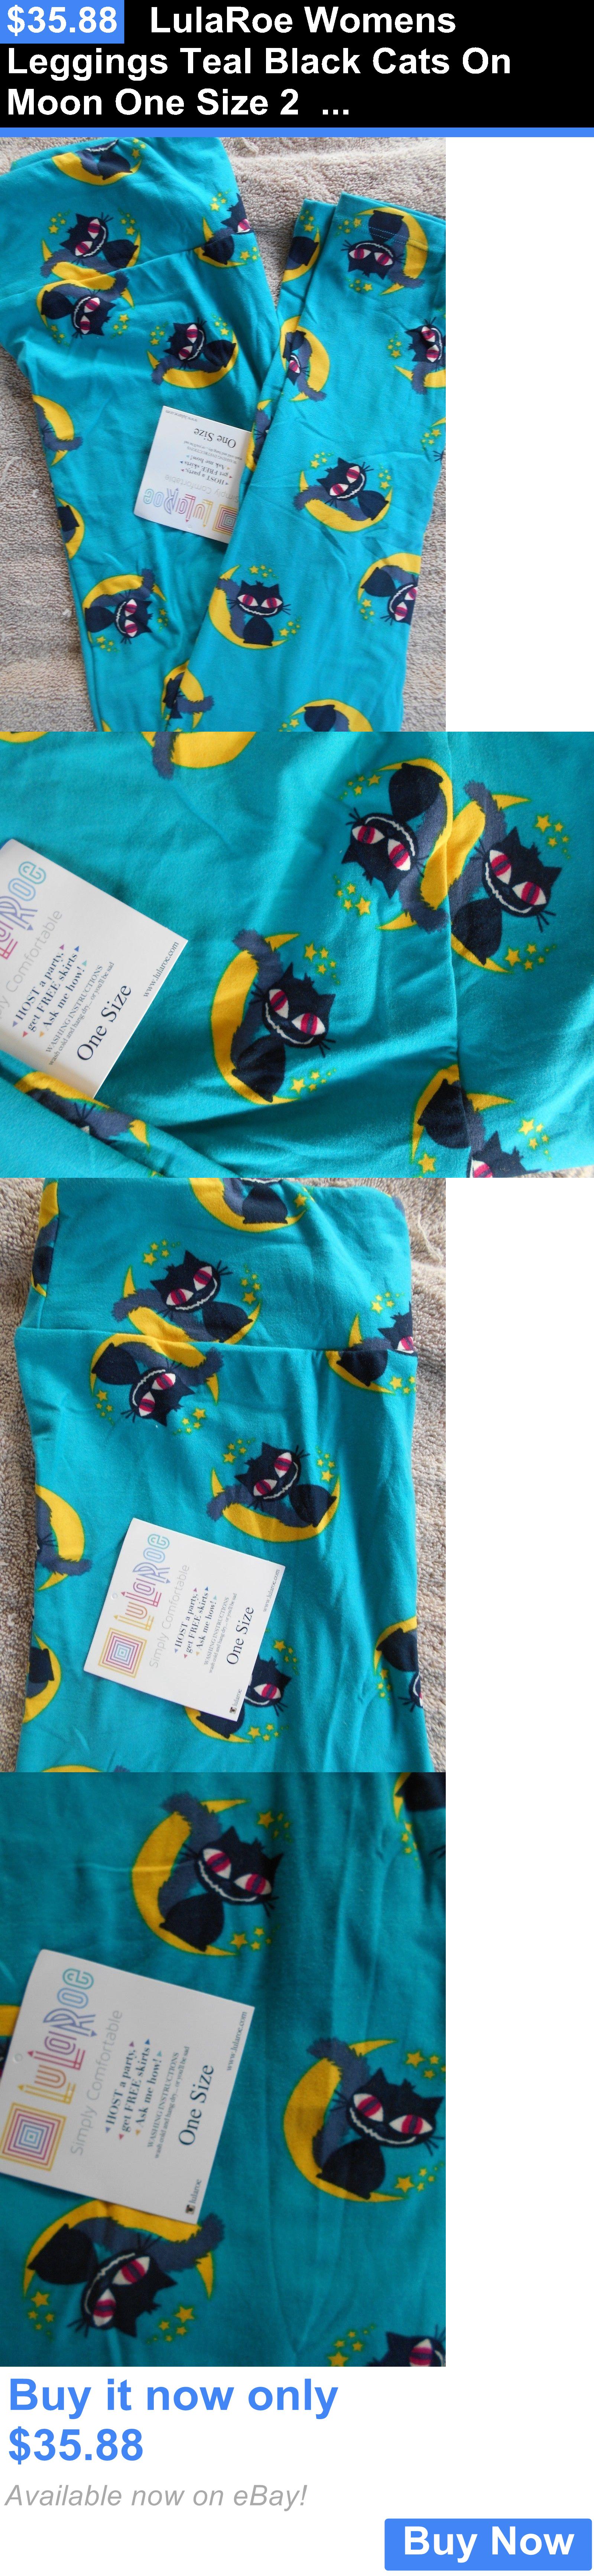 Women Leggings Lularoe Womens Teal Black Cats On Moon One Mooi Cardigan Top Unicorn Size S 2 10 Os